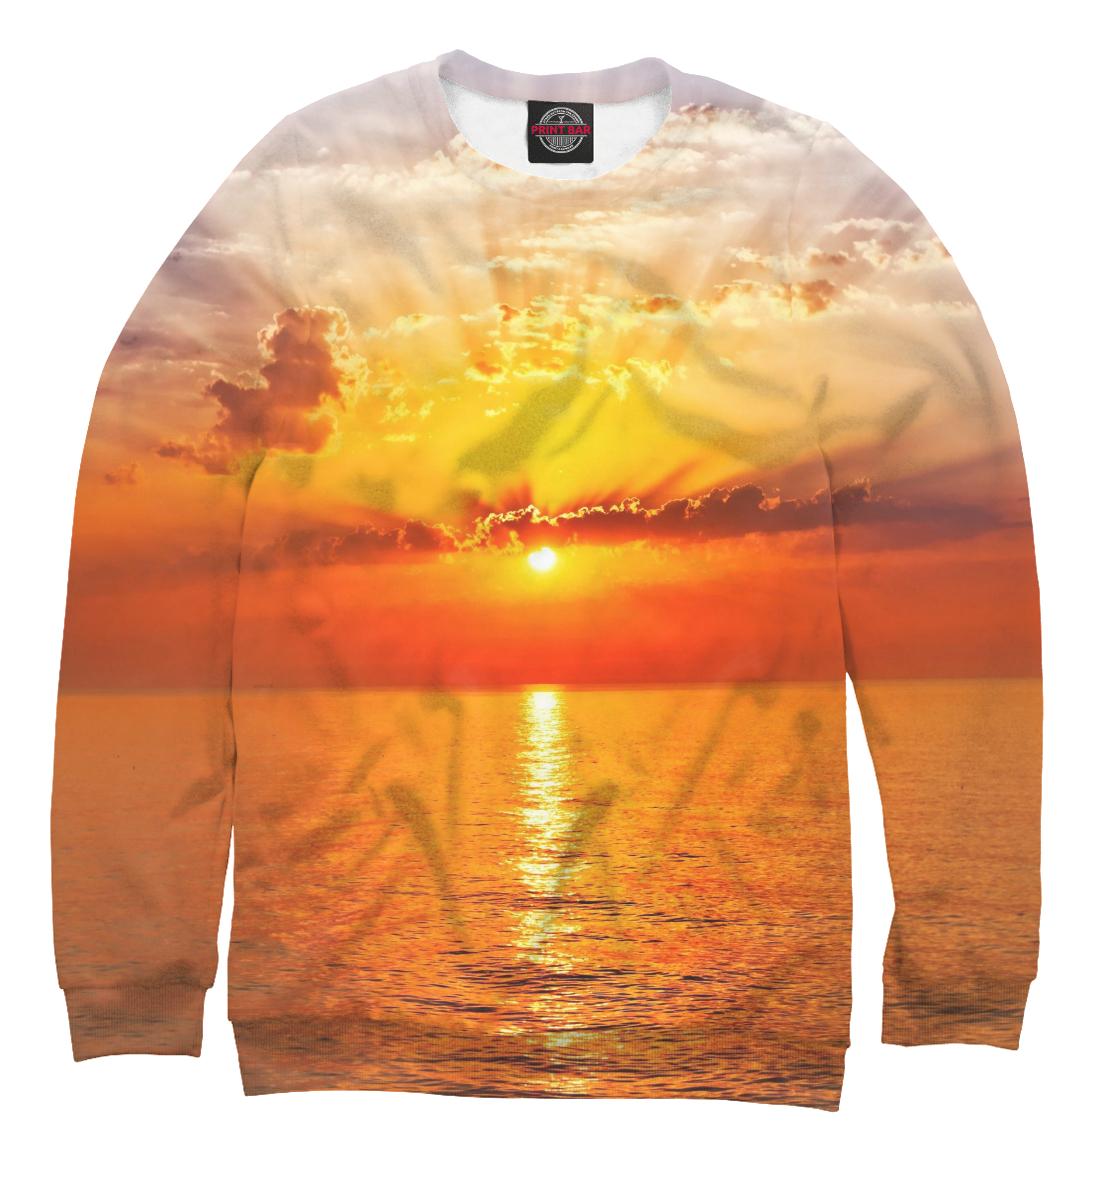 Купить Потрясающий закат на море, Printbar, Свитшоты, SUN-572823-swi-1